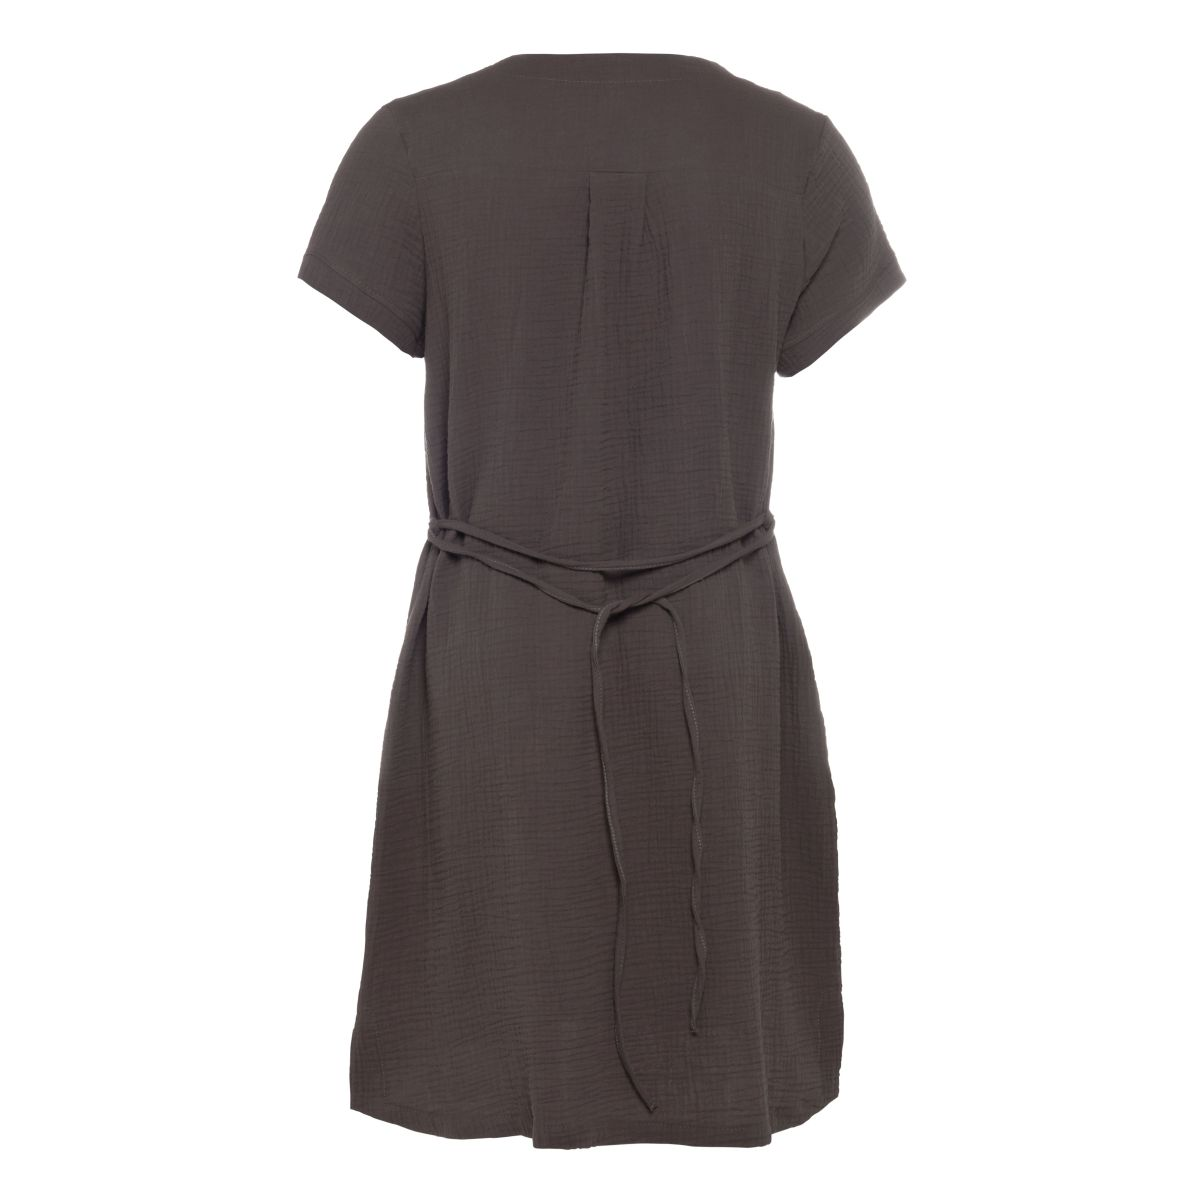 knit factory kf15012001052 indy jurk antraciet xl 2